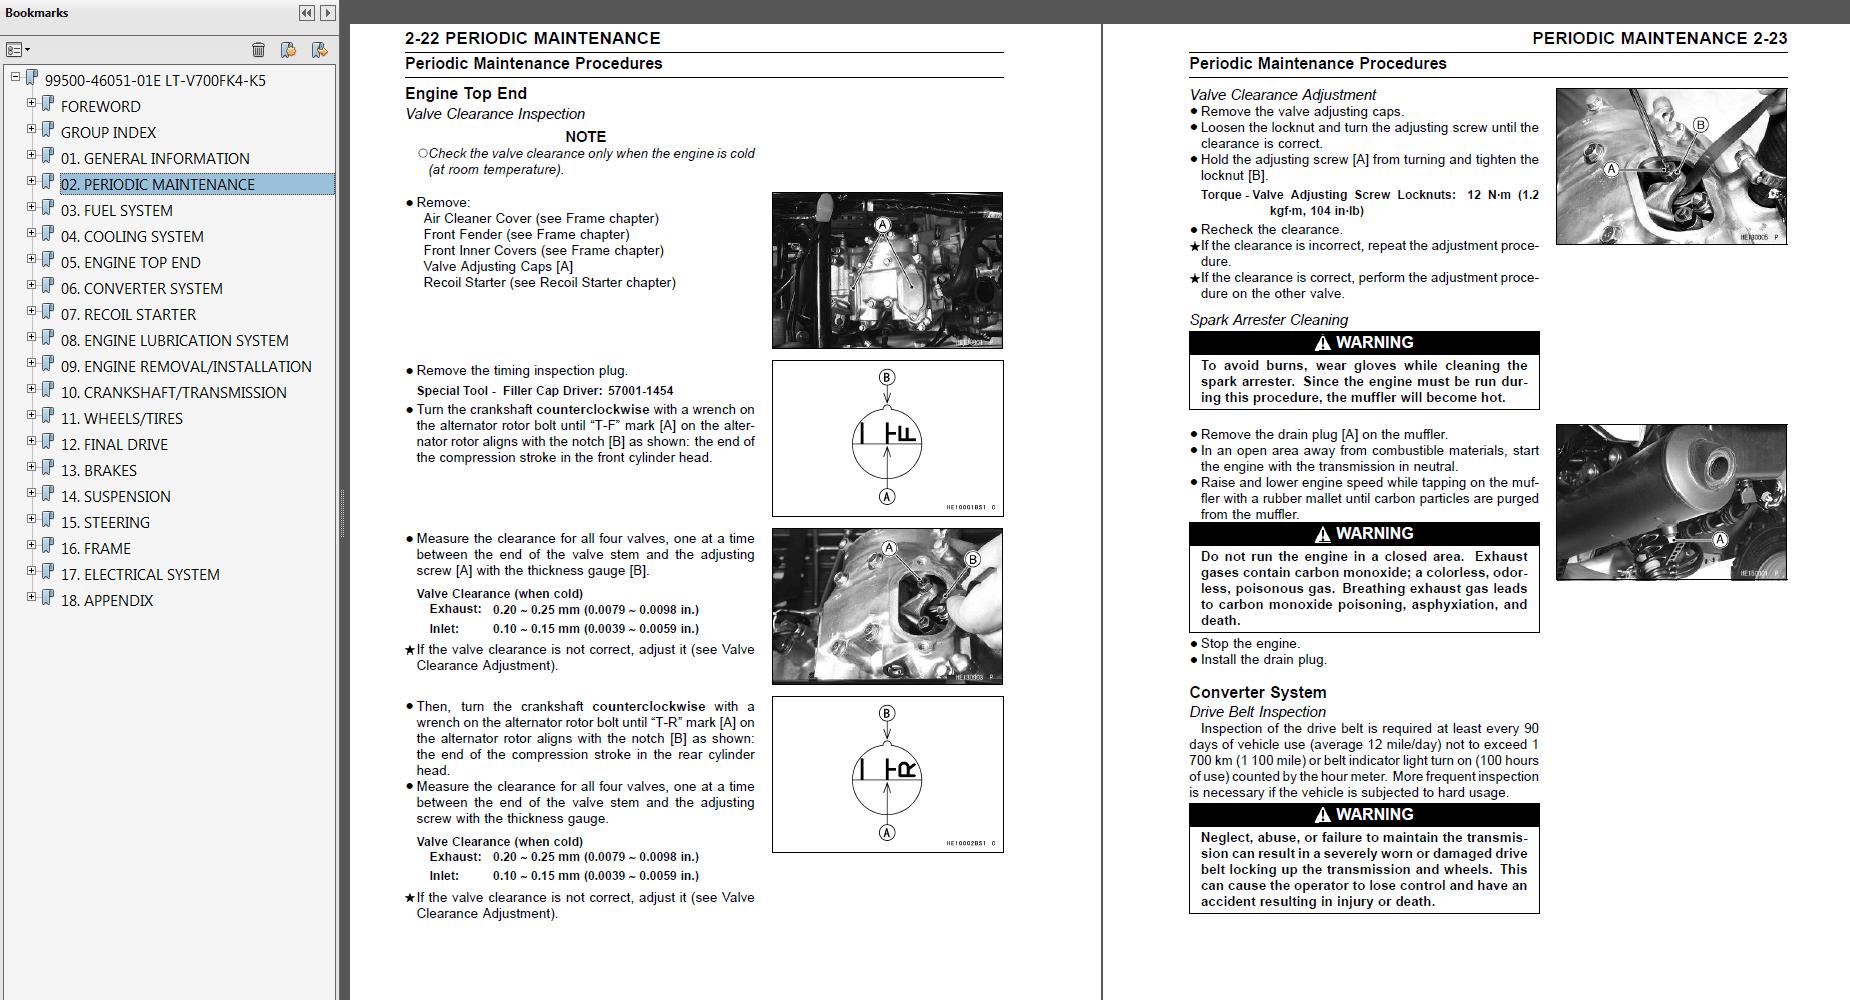 hight resolution of 2004 2005 suzuki lt v700f twin peaks 700 repair service manual myatvmanual